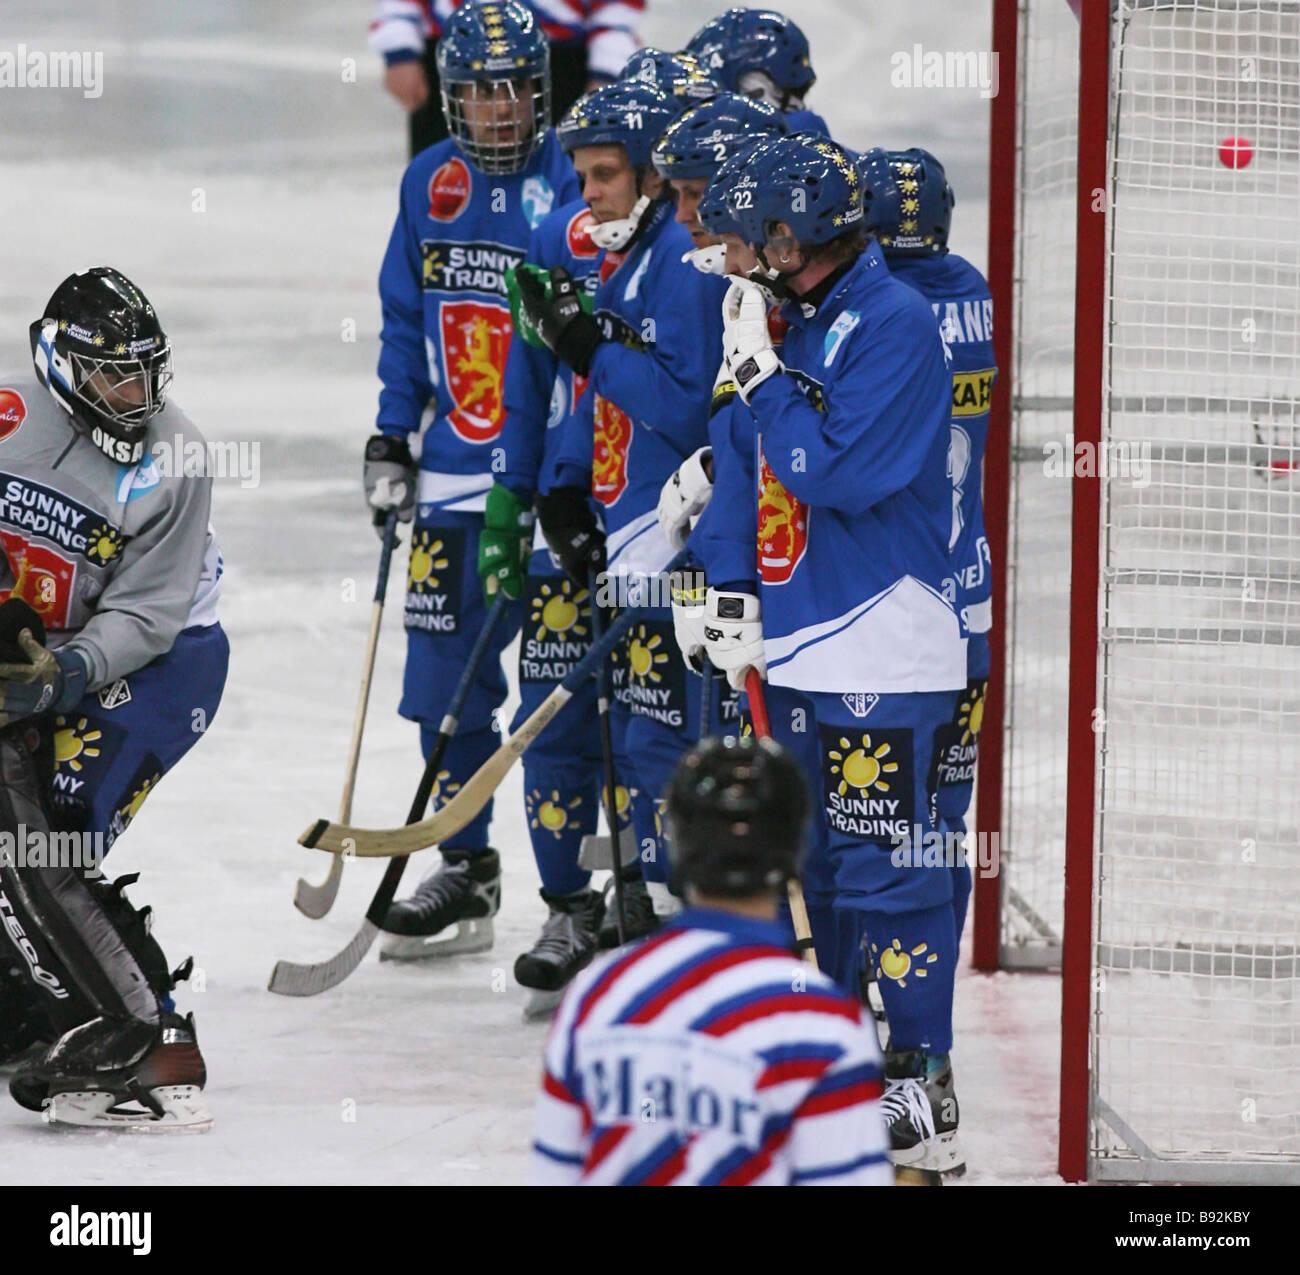 Un jugador de hockey ruso marcó un gol a Finlandia Imagen De Stock